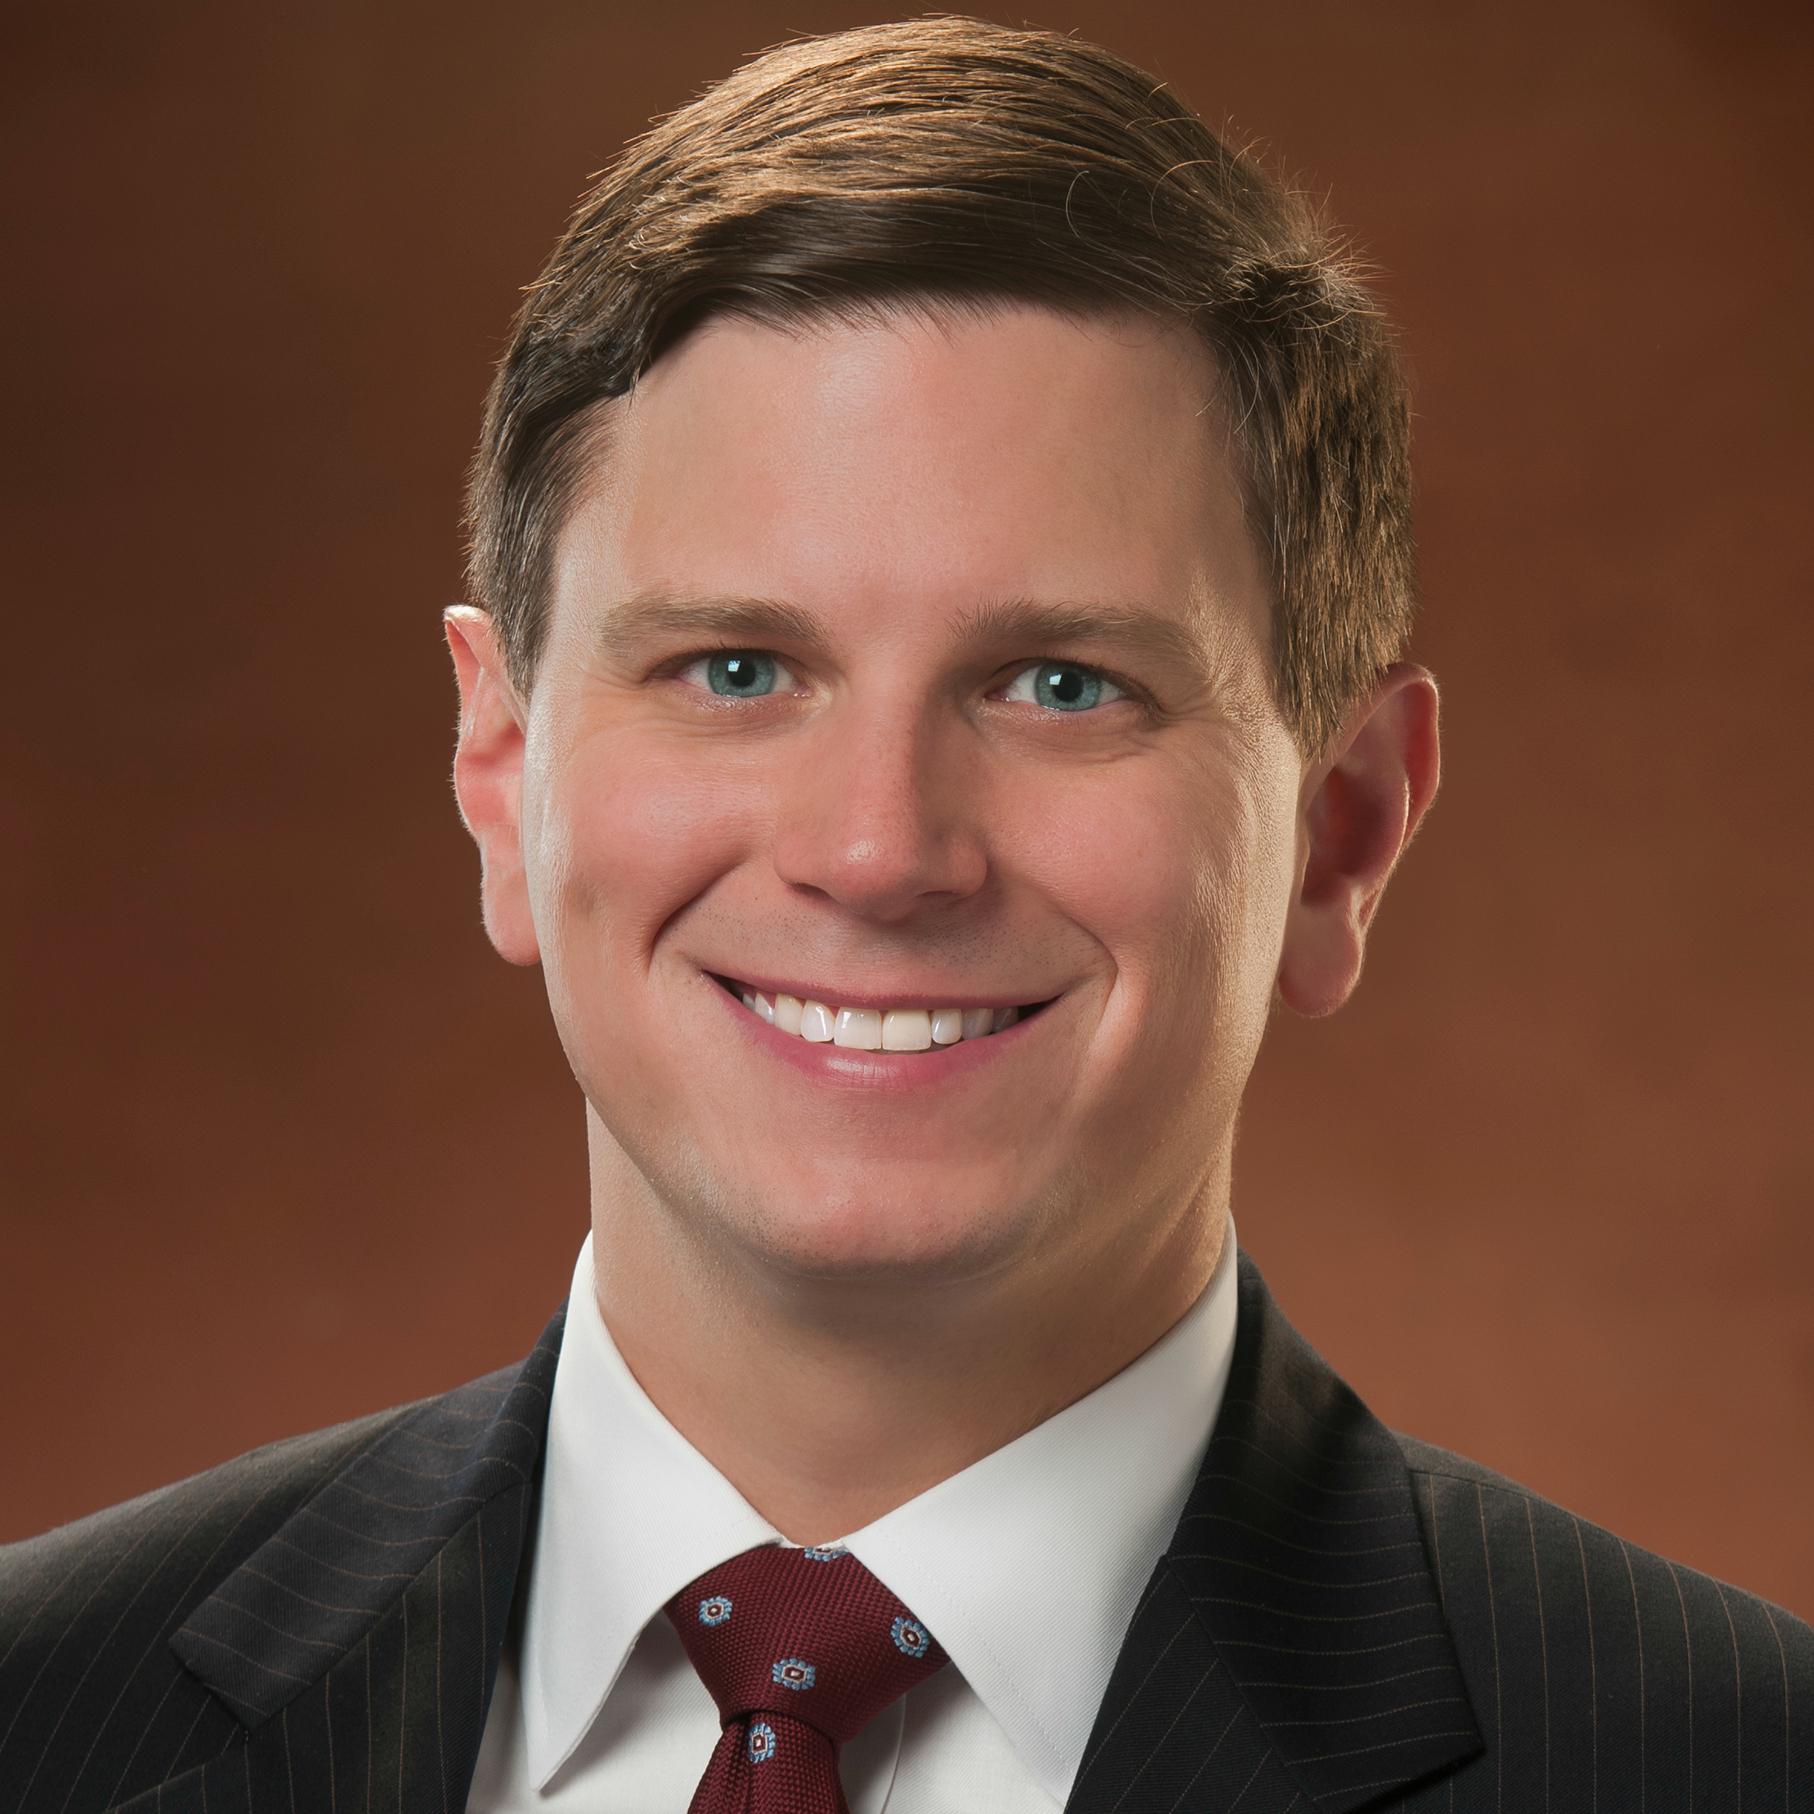 Legal Services - David Wicker - Headshot.jpg